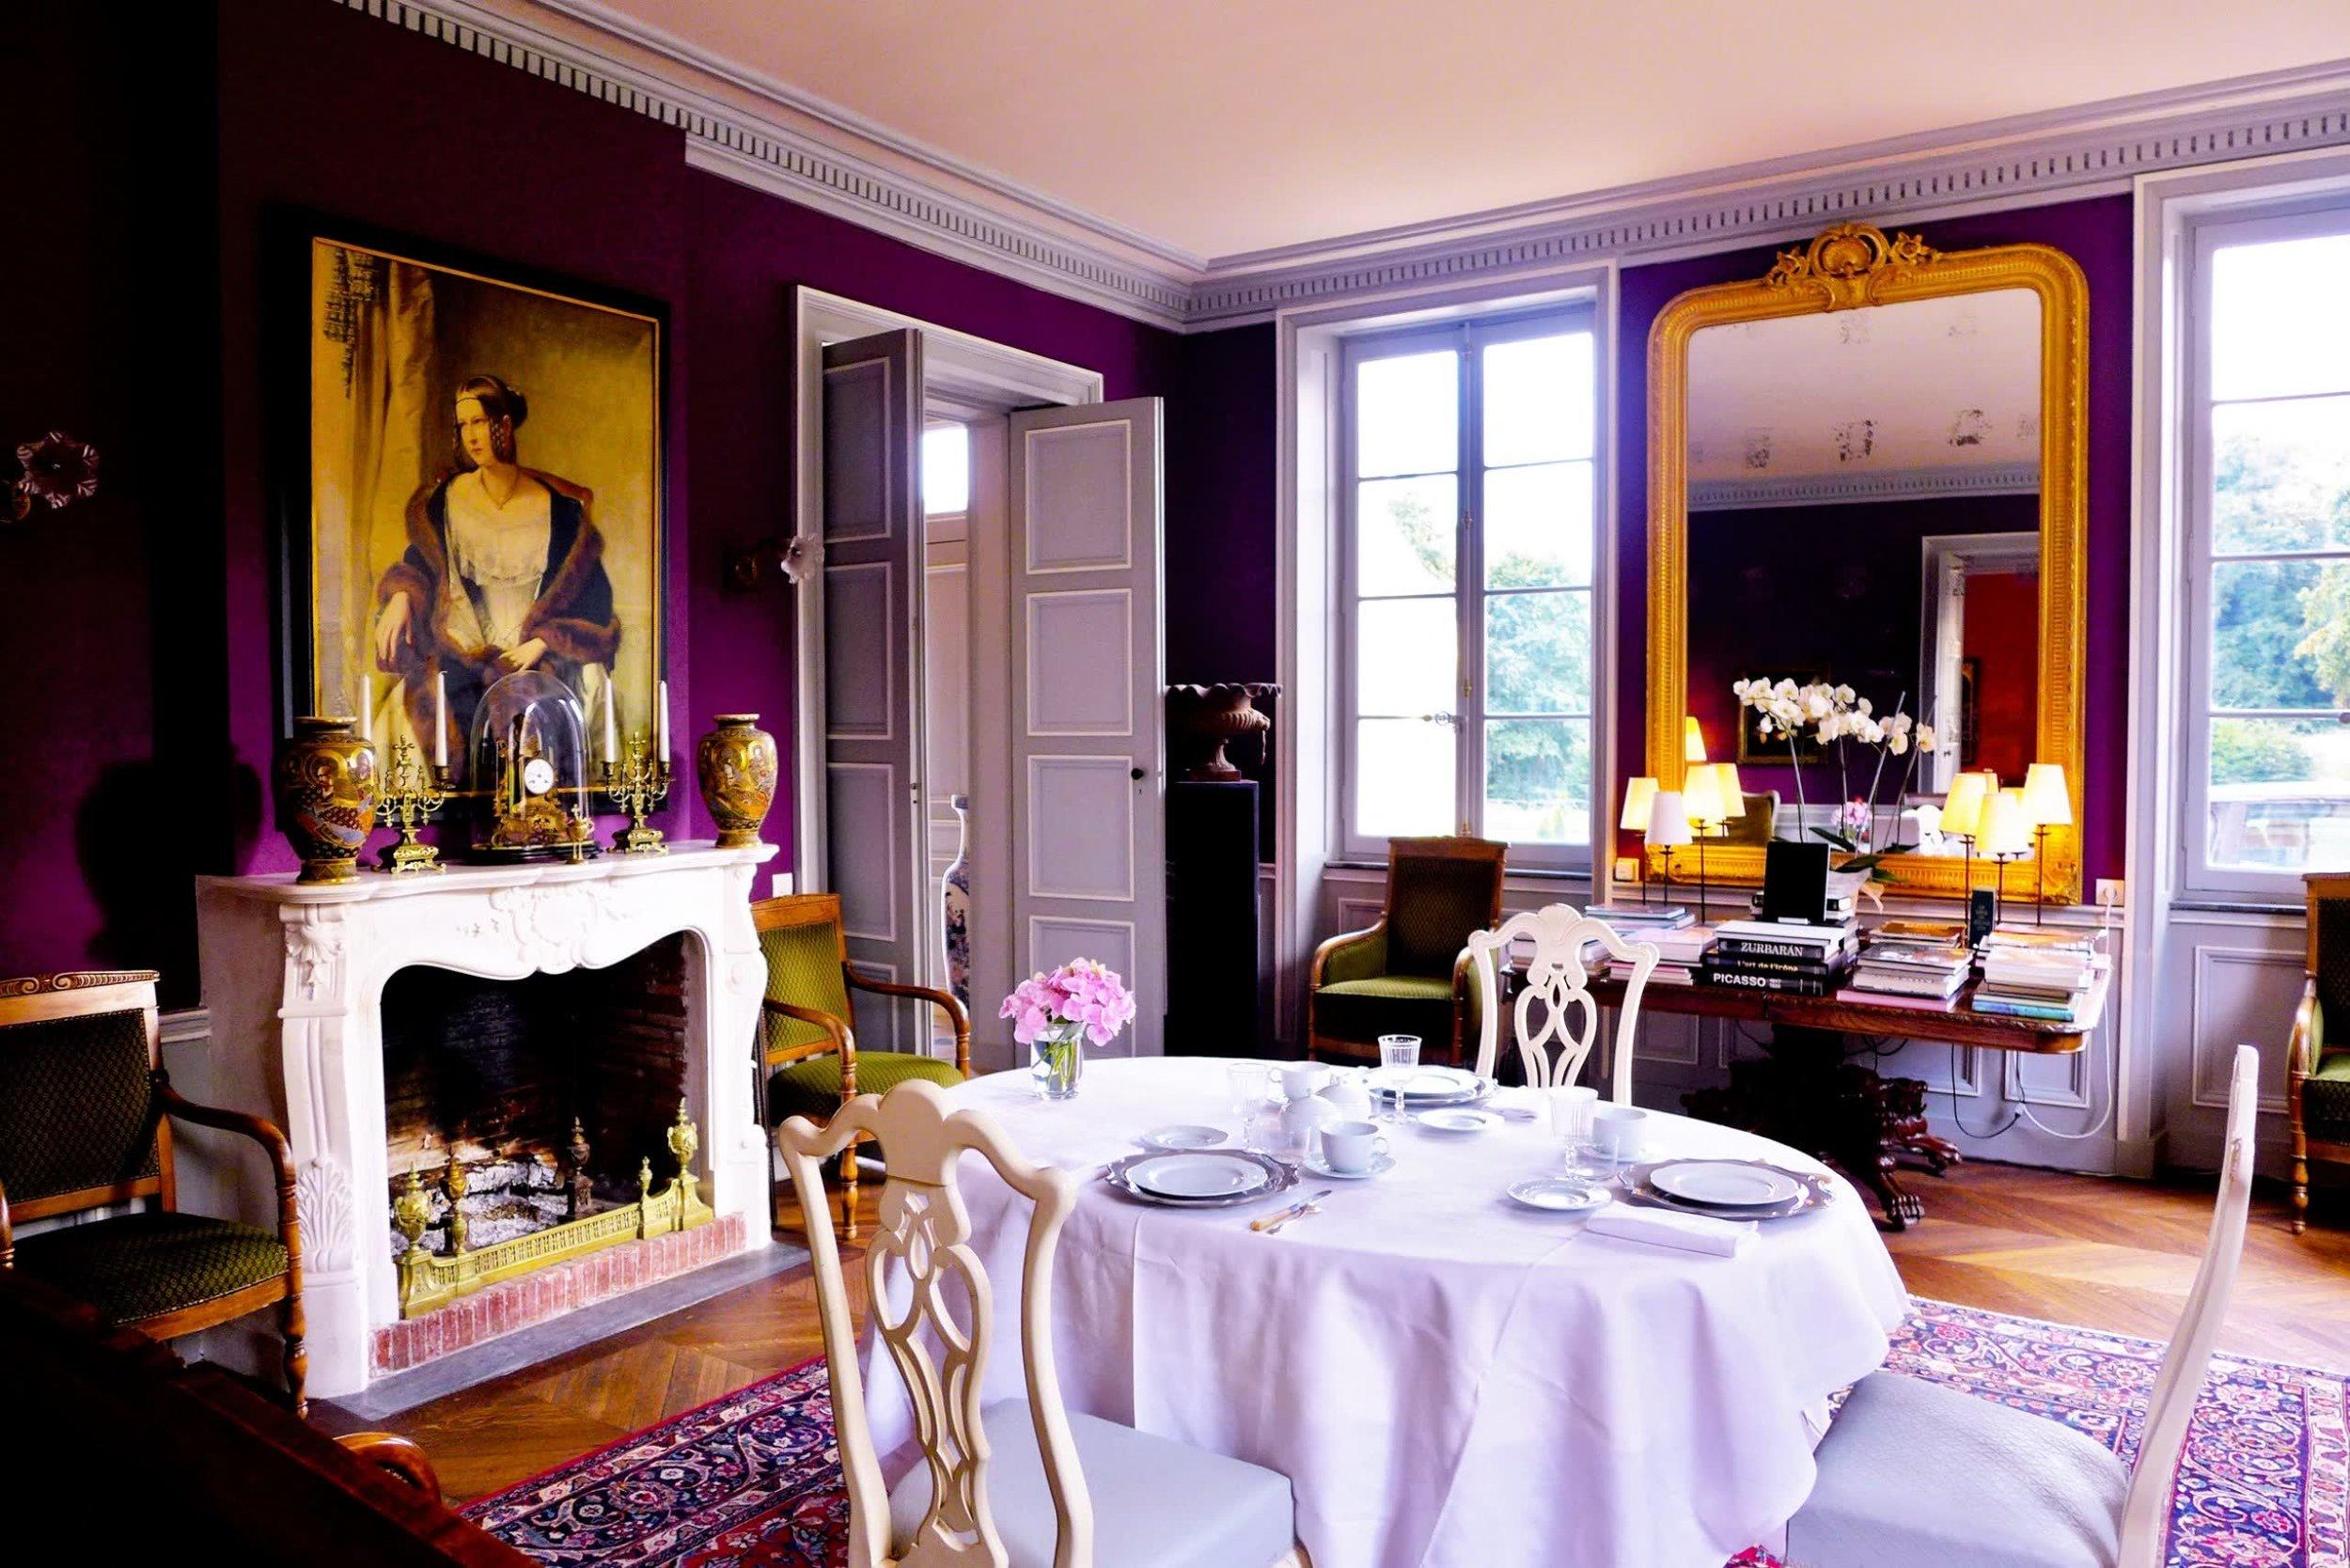 Chateau de la Pommeraye - charming boutique hotel chateau b&b spa normandy calvados Living room 2(1).jpg